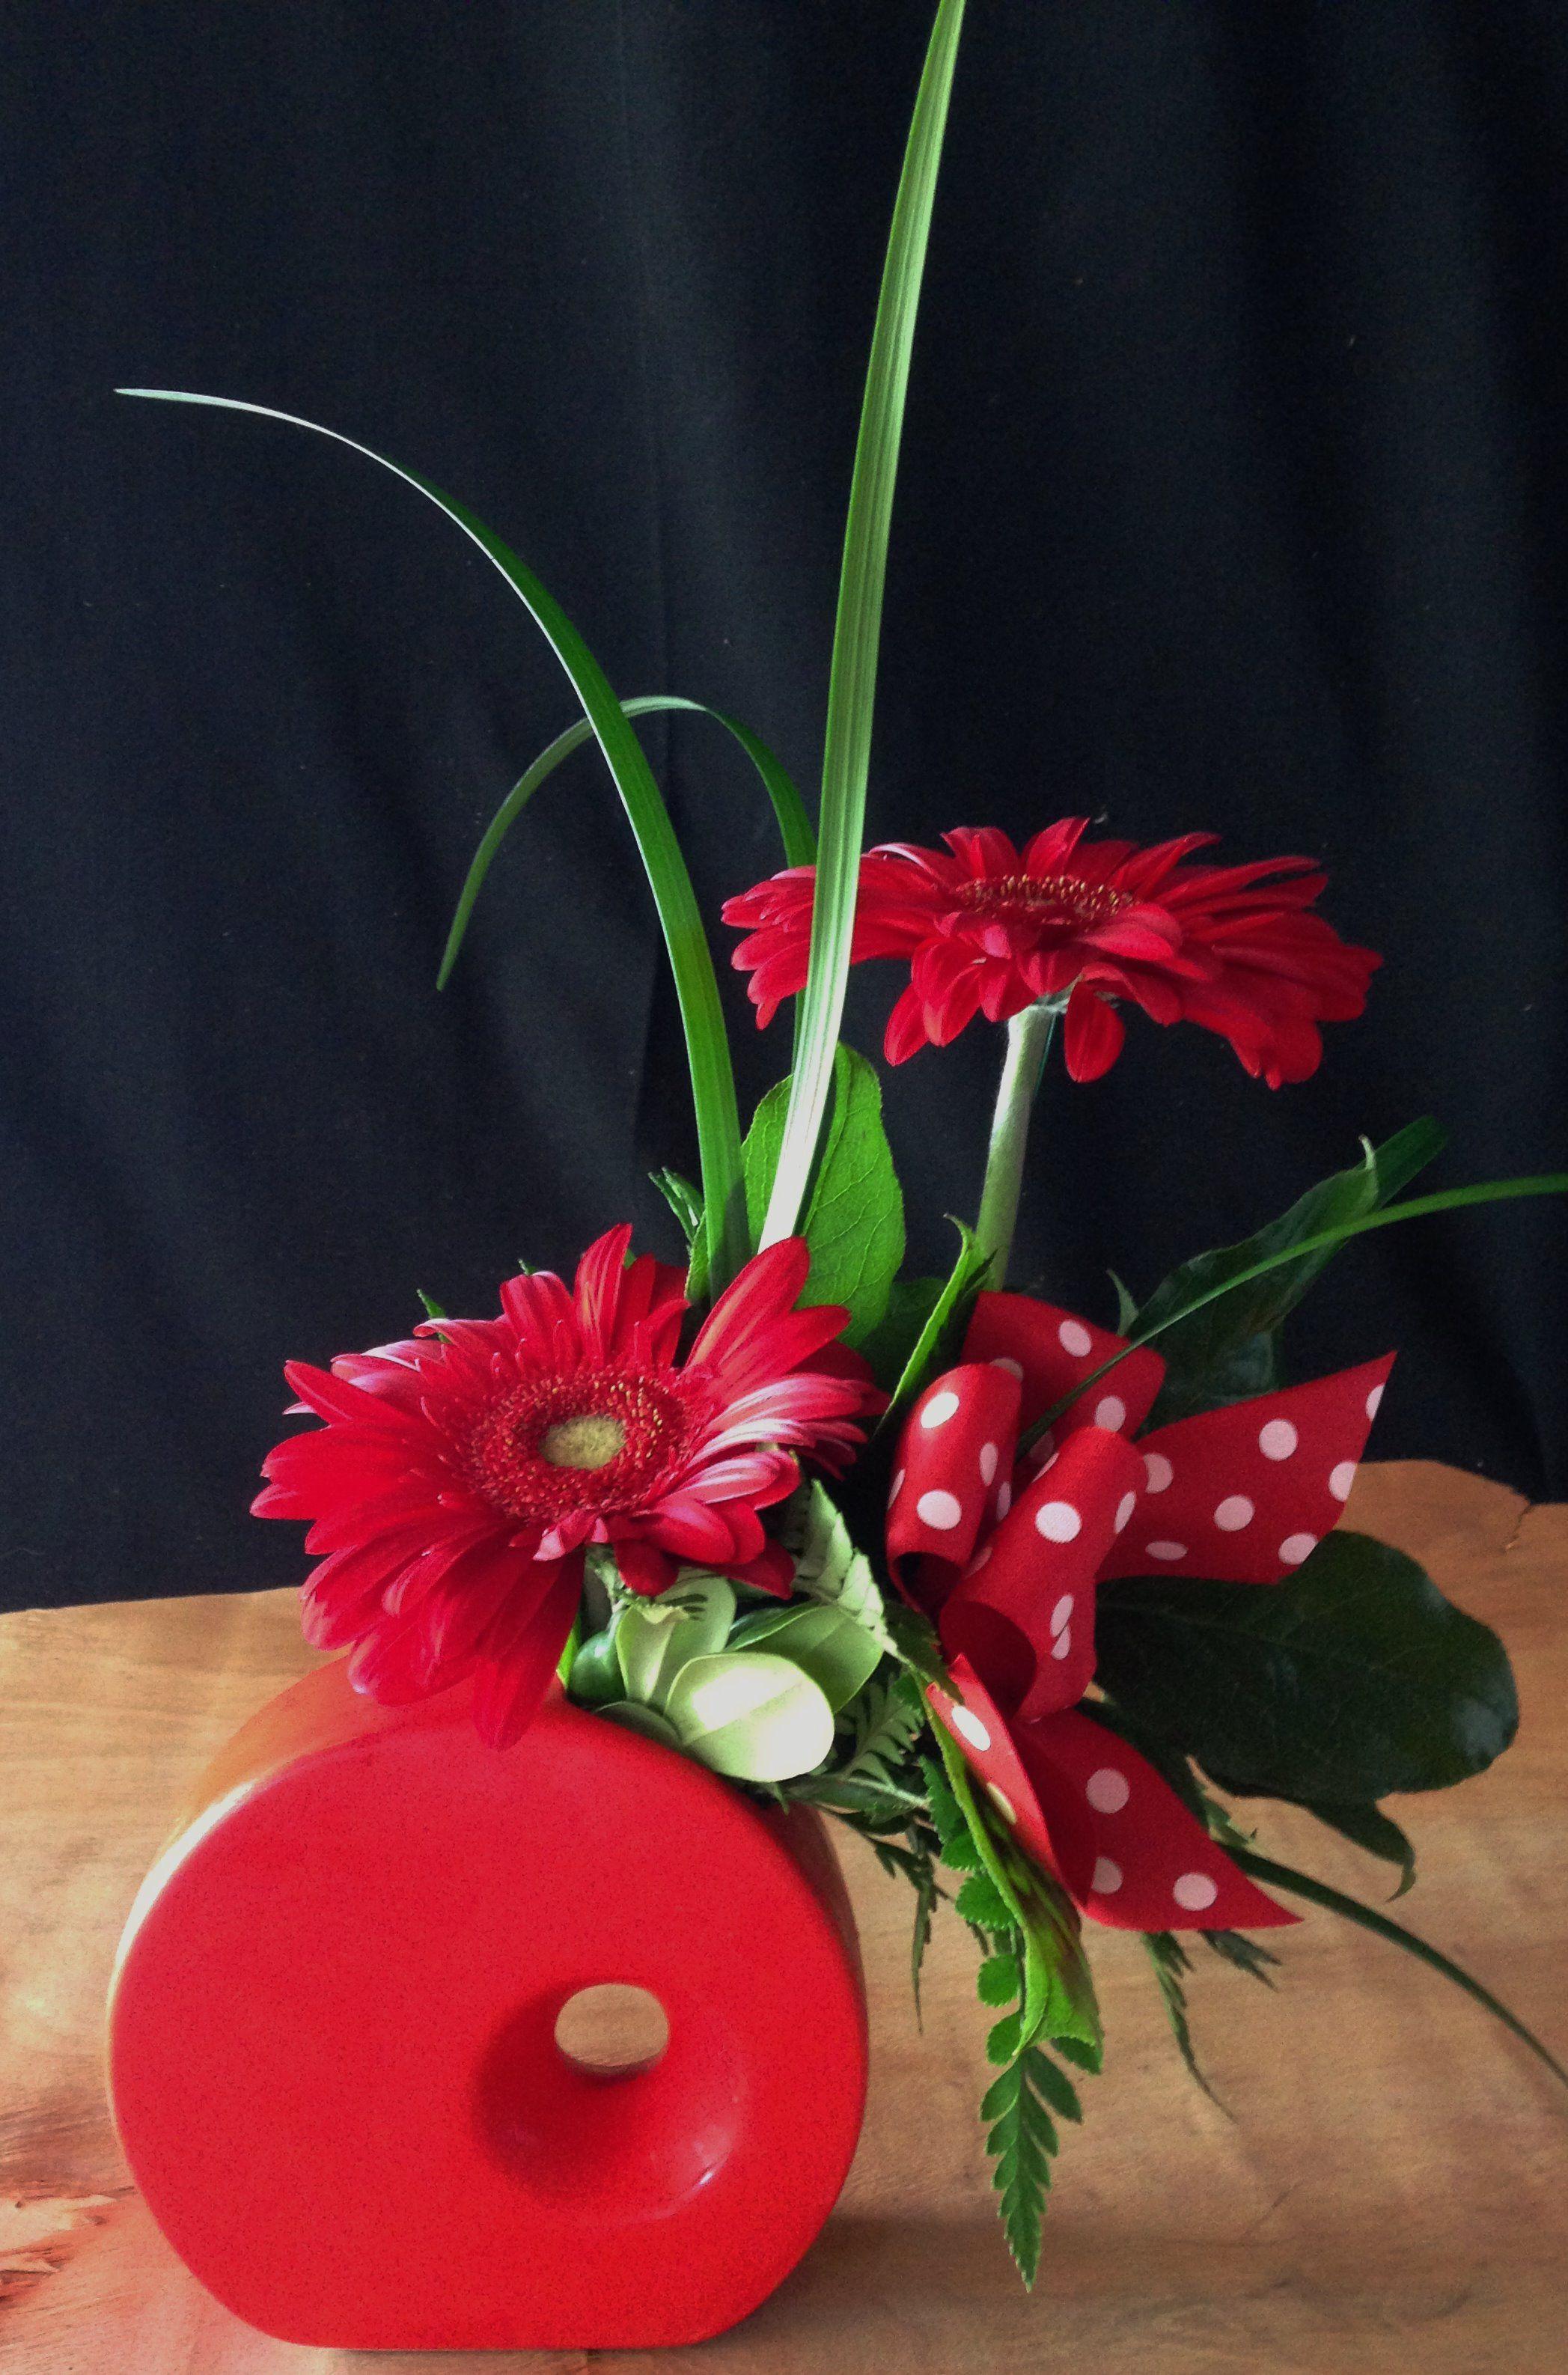 throwing a vase of red ceramic vase image funky red ceramic vase filled with red inside funky red ceramic vase filled with red gerbera daisies and a polka